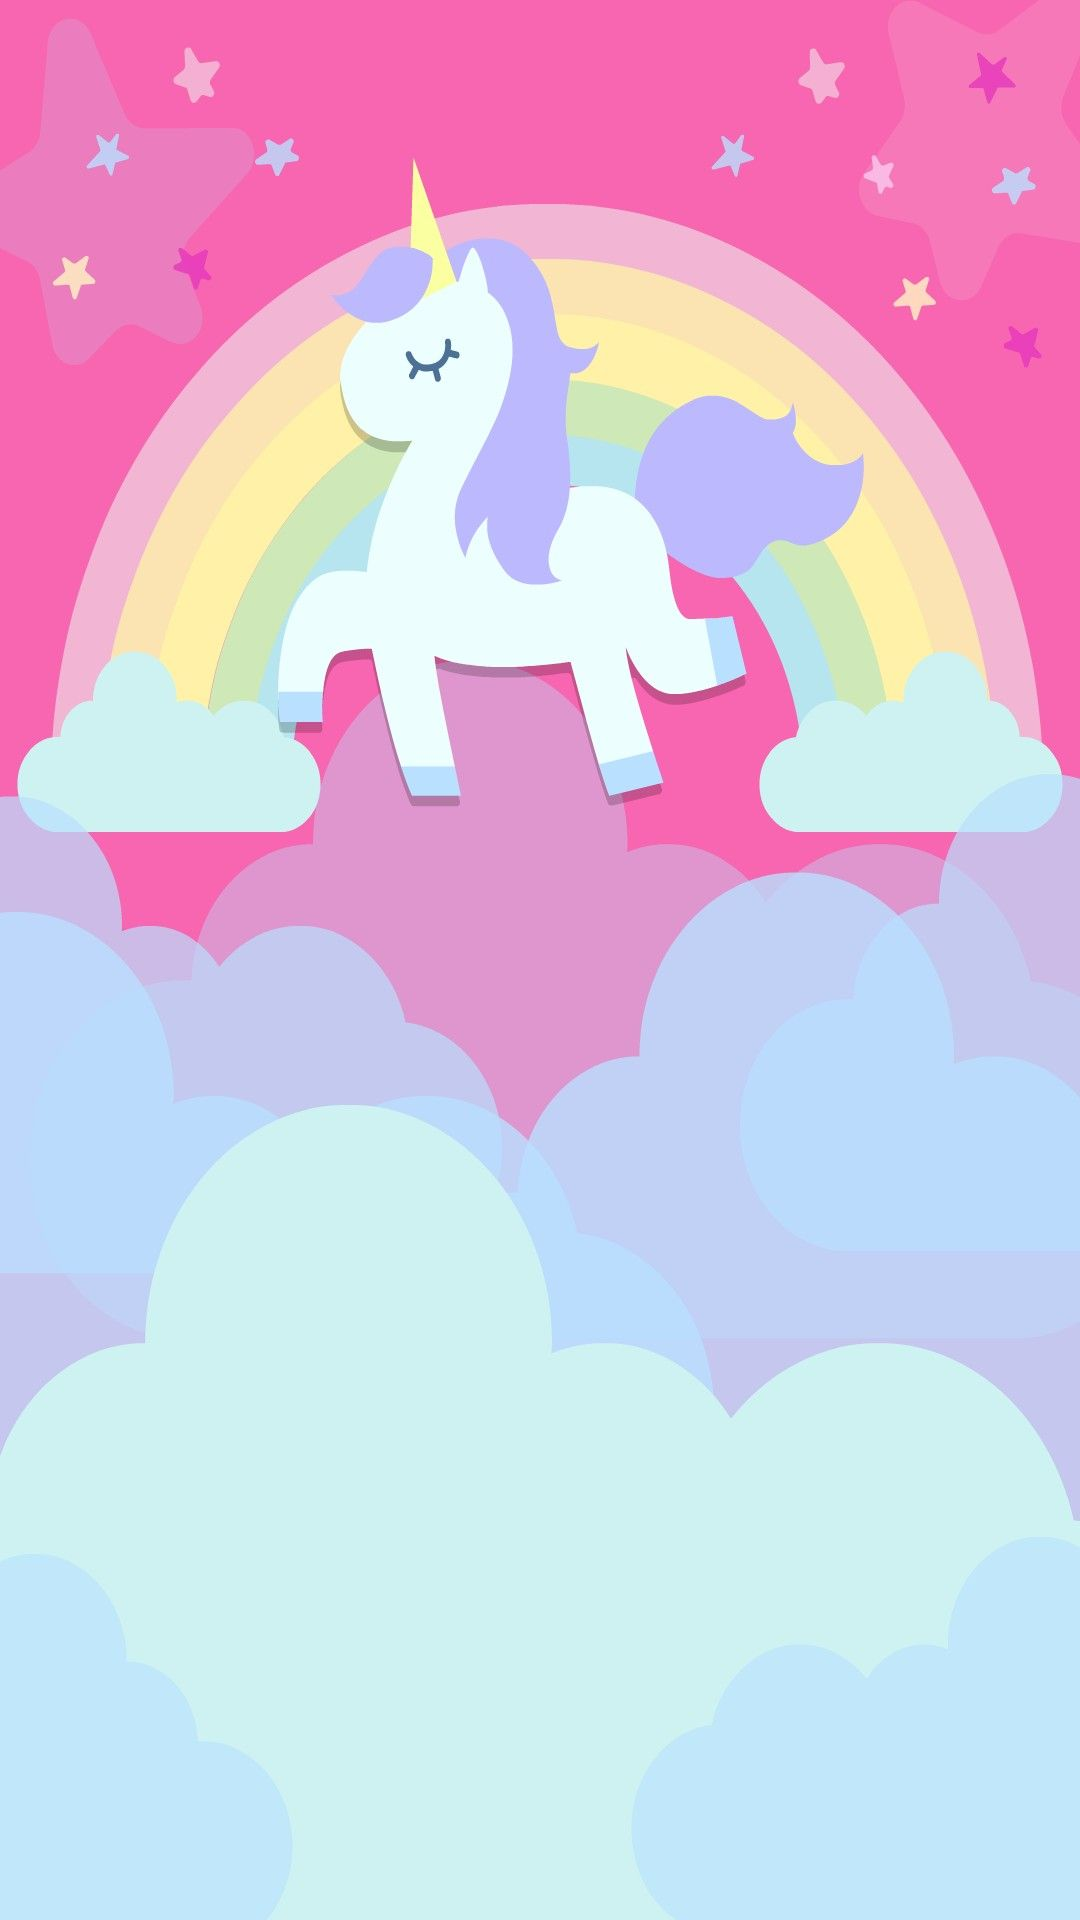 Explore More Wallpapers Unicorn Wallpaper Cute Iphone Wallpaper Unicorn Pink Unicorn Wallpaper